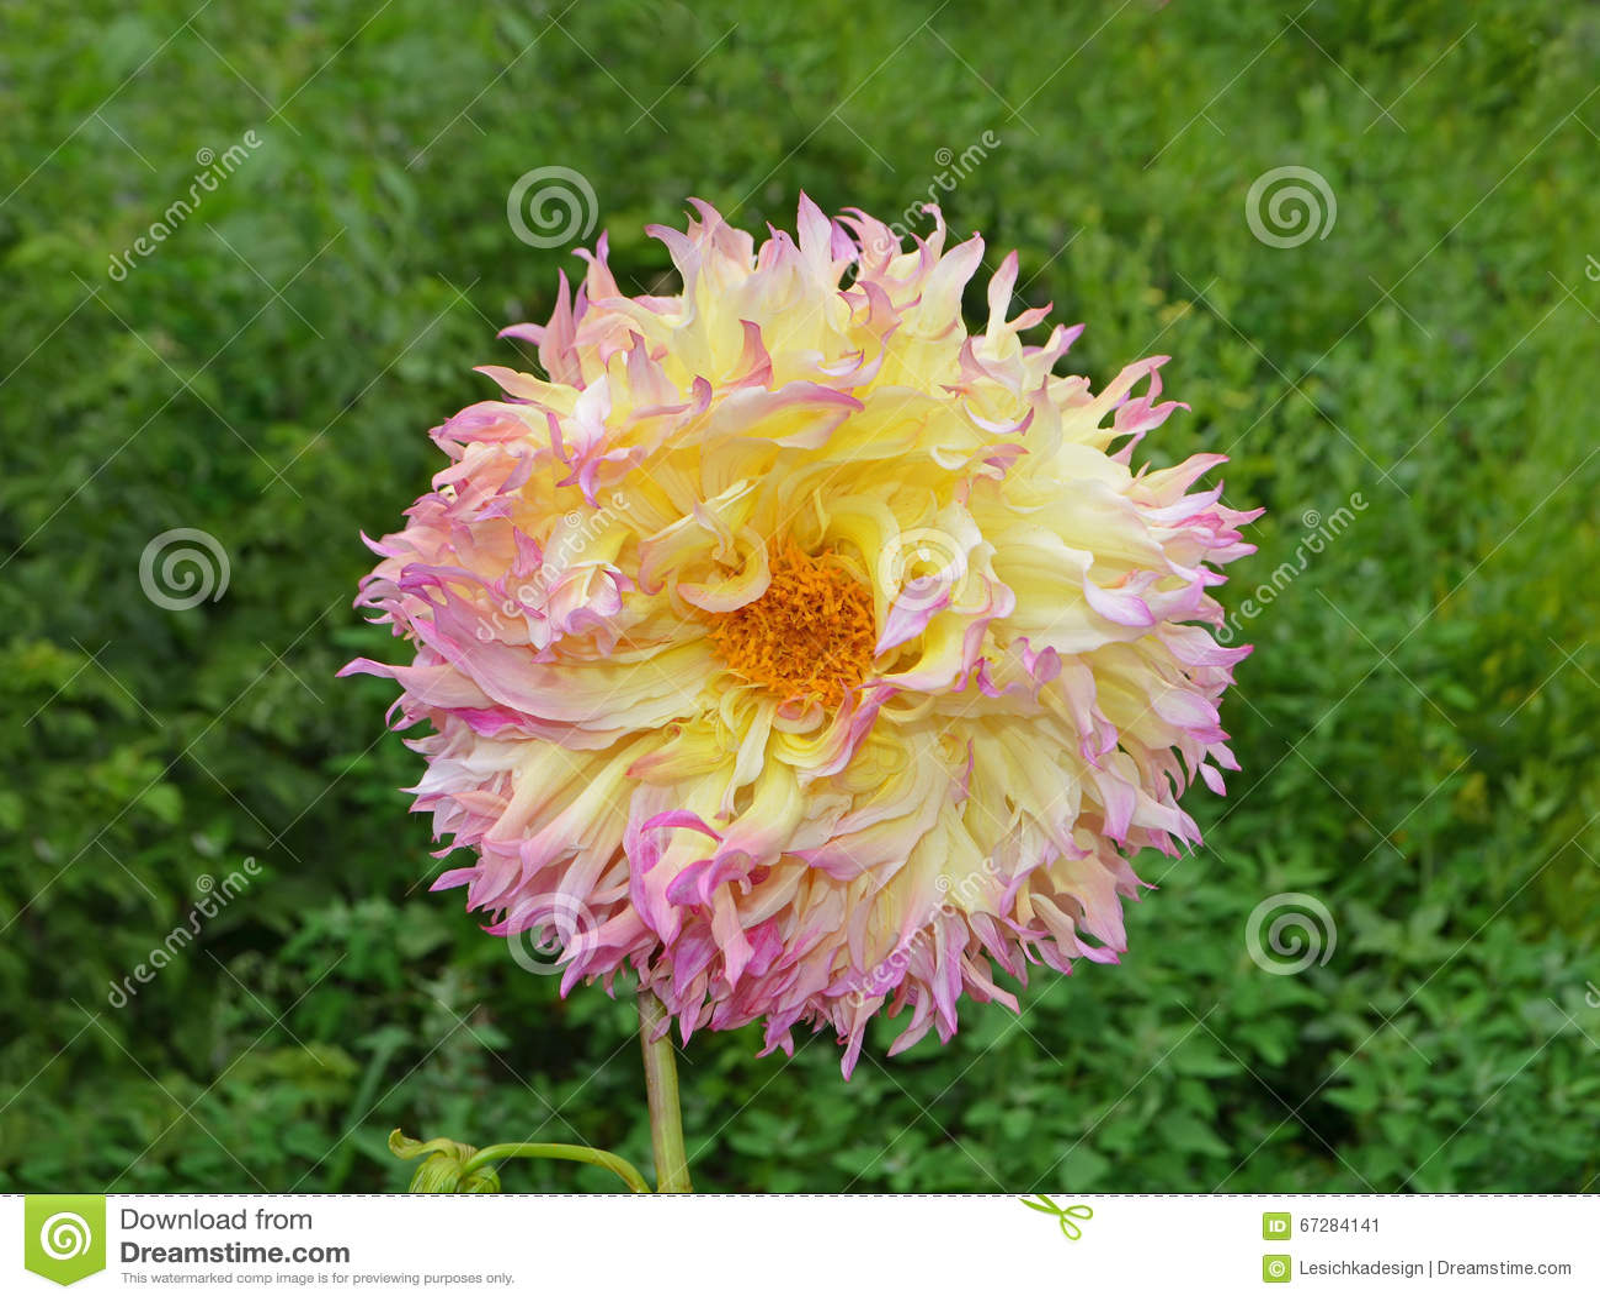 Yellow pink and orange dahlia flower in garden stock image image royalty free stock photo izmirmasajfo